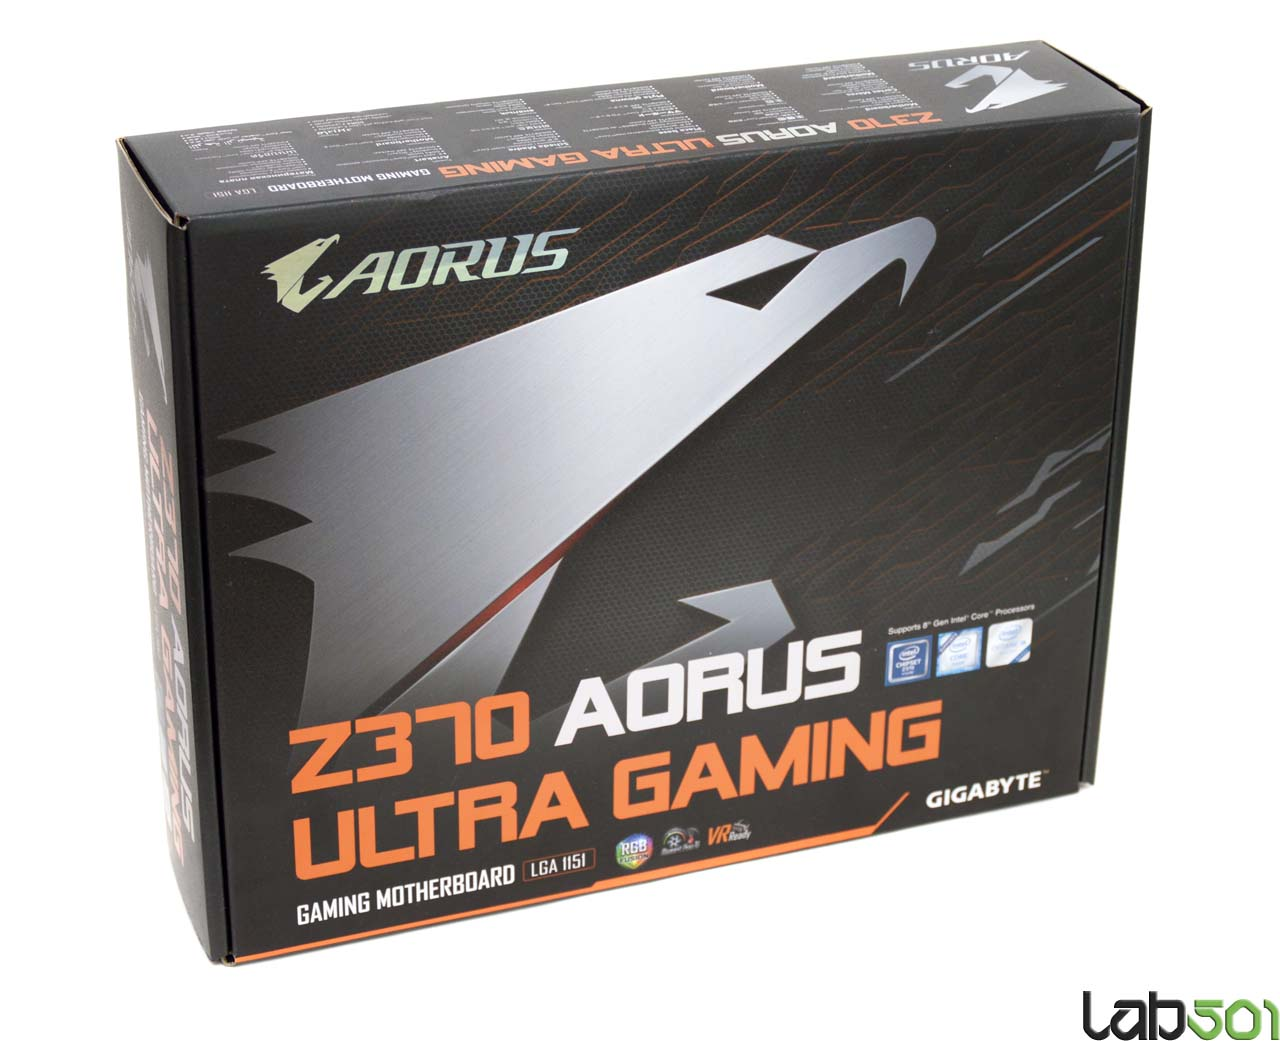 gigabyte z370 aorus gaming 5 manual